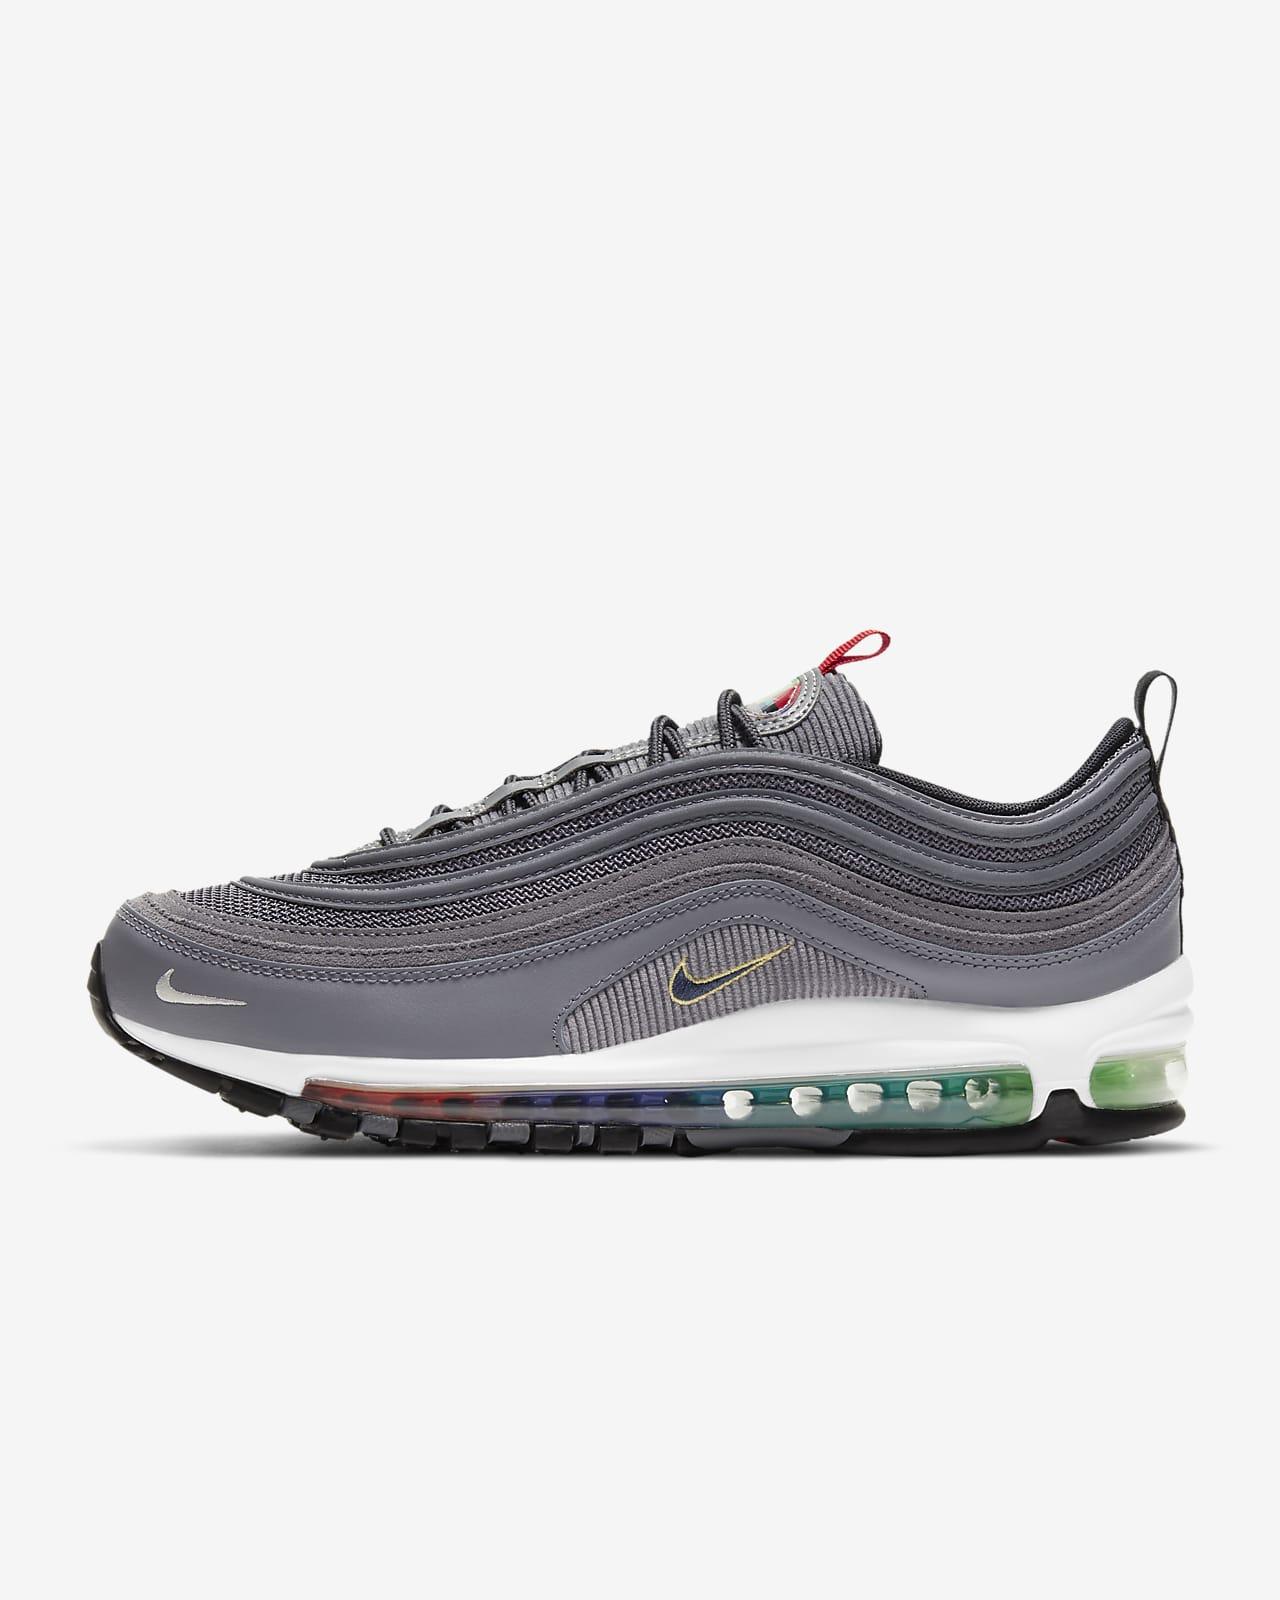 Nike Air Max 97 EOI Erkek Ayakkabısı